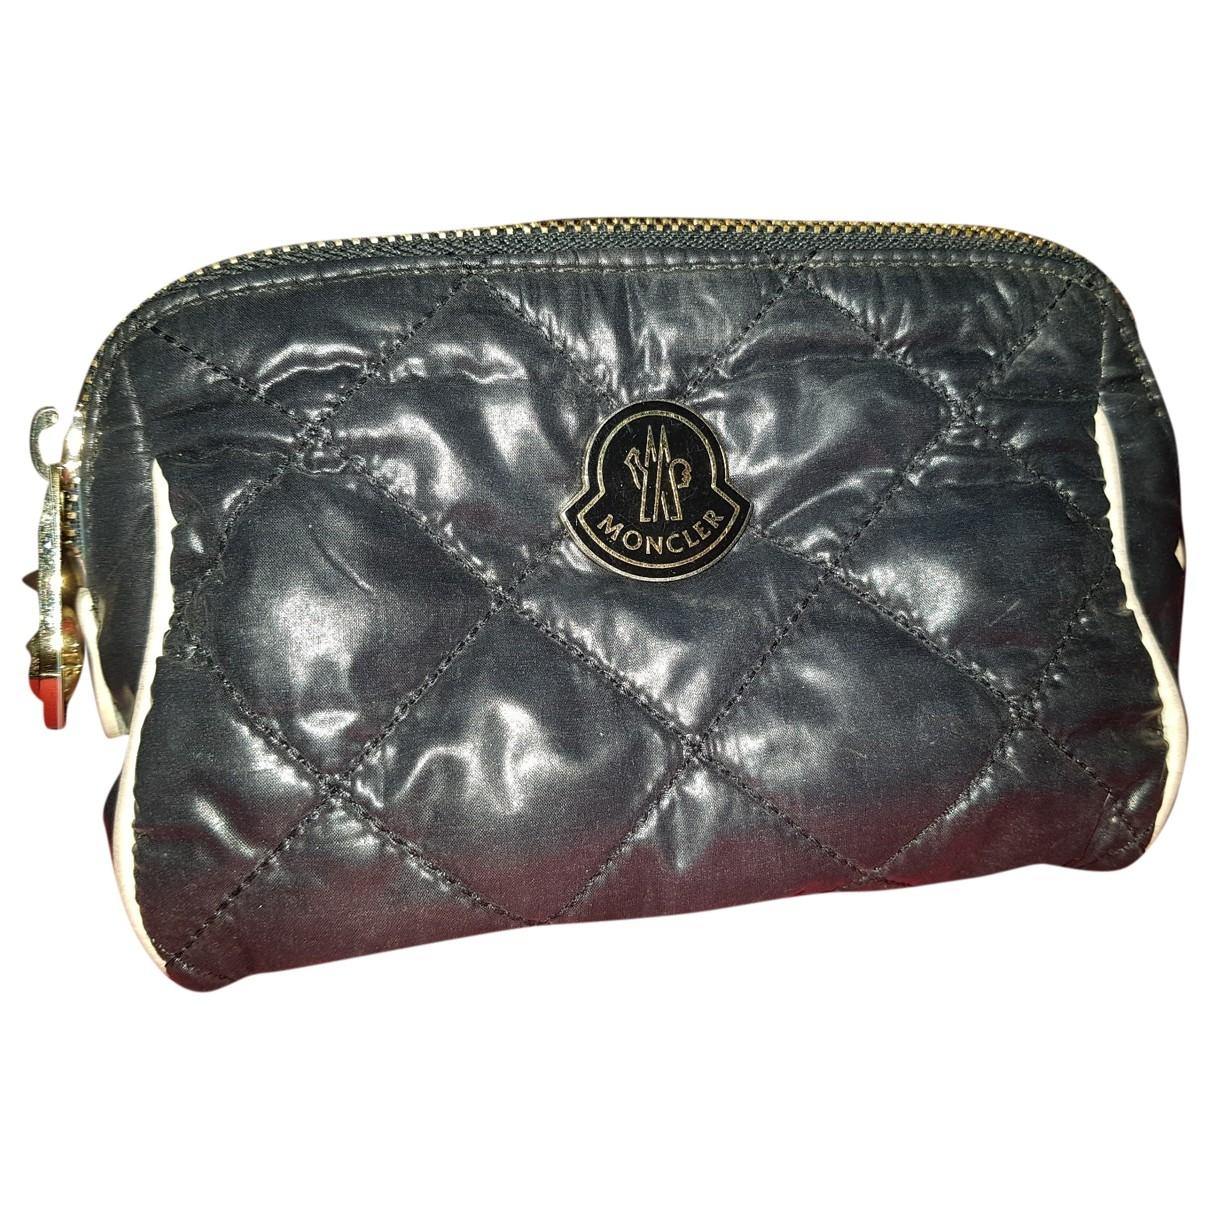 Moncler \N Black Clutch bag for Women \N